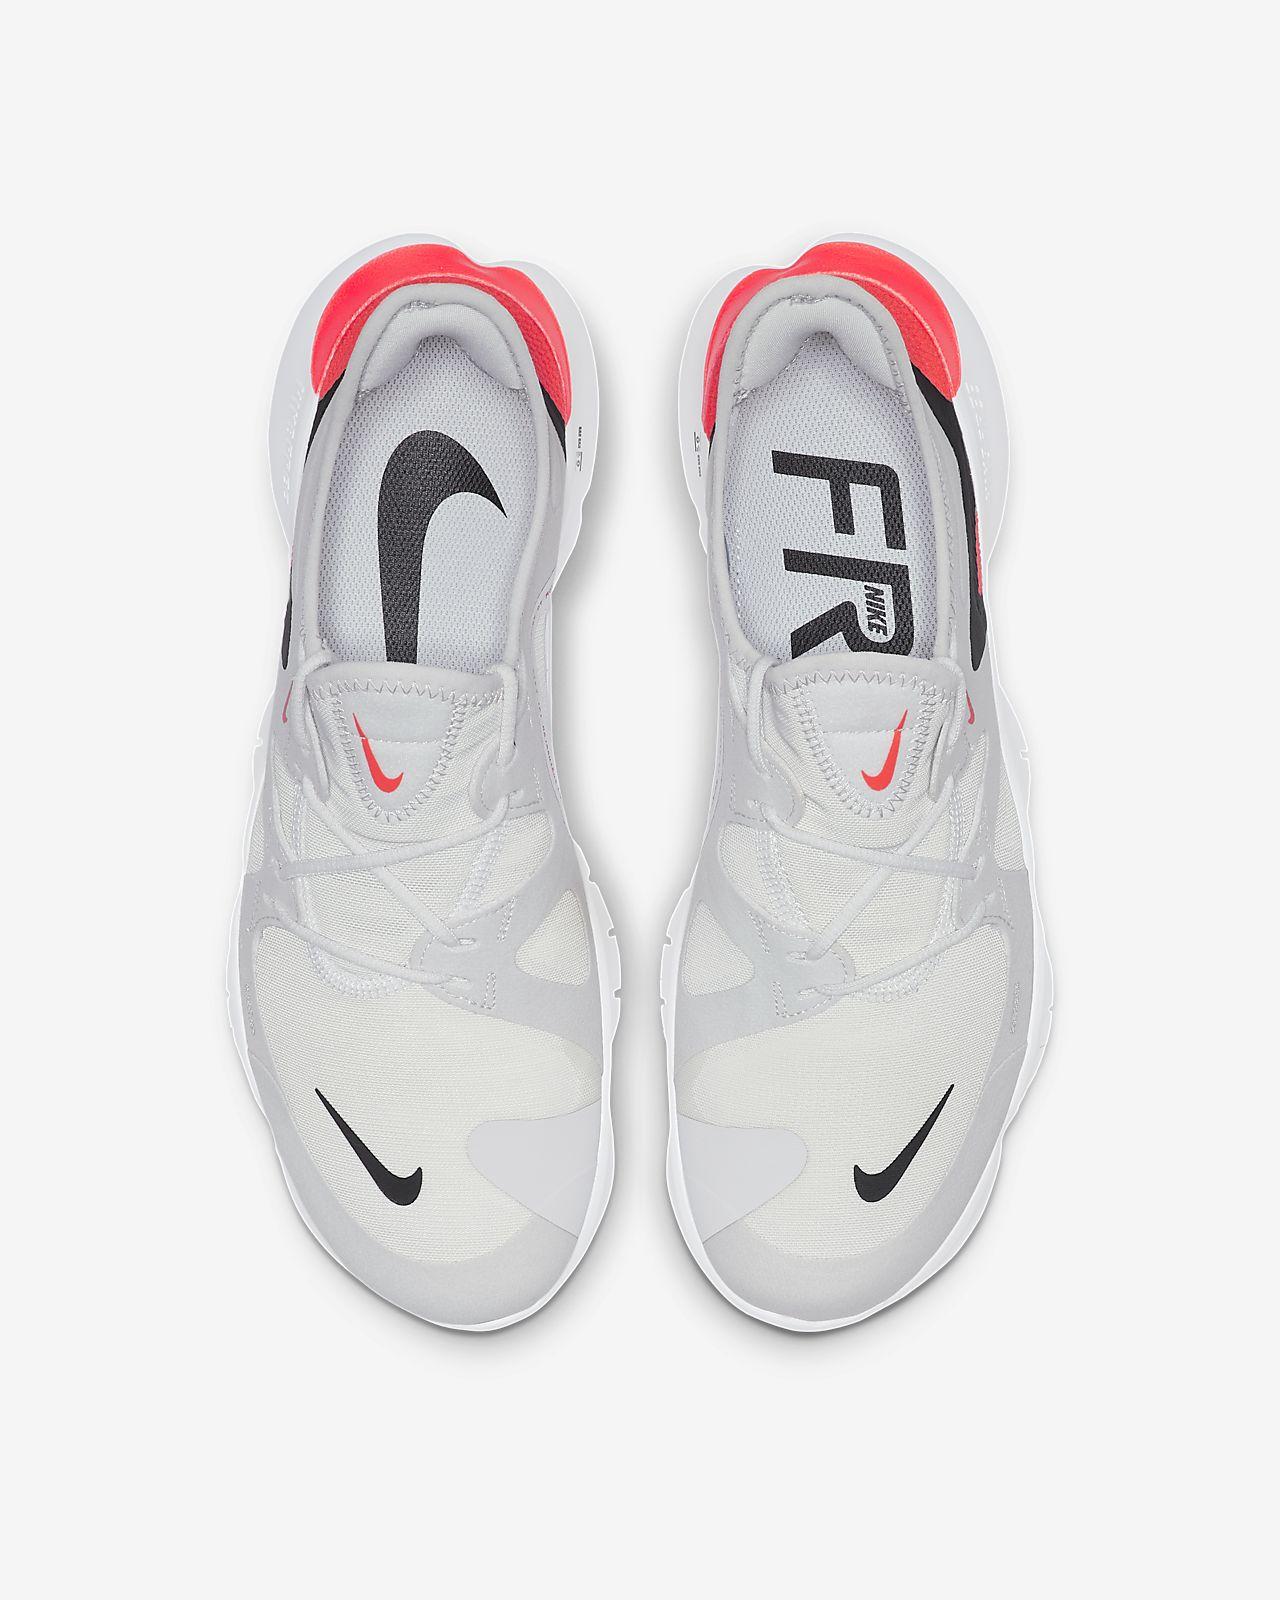 Nike Men's Free Breathe Running Shoe Synthetic